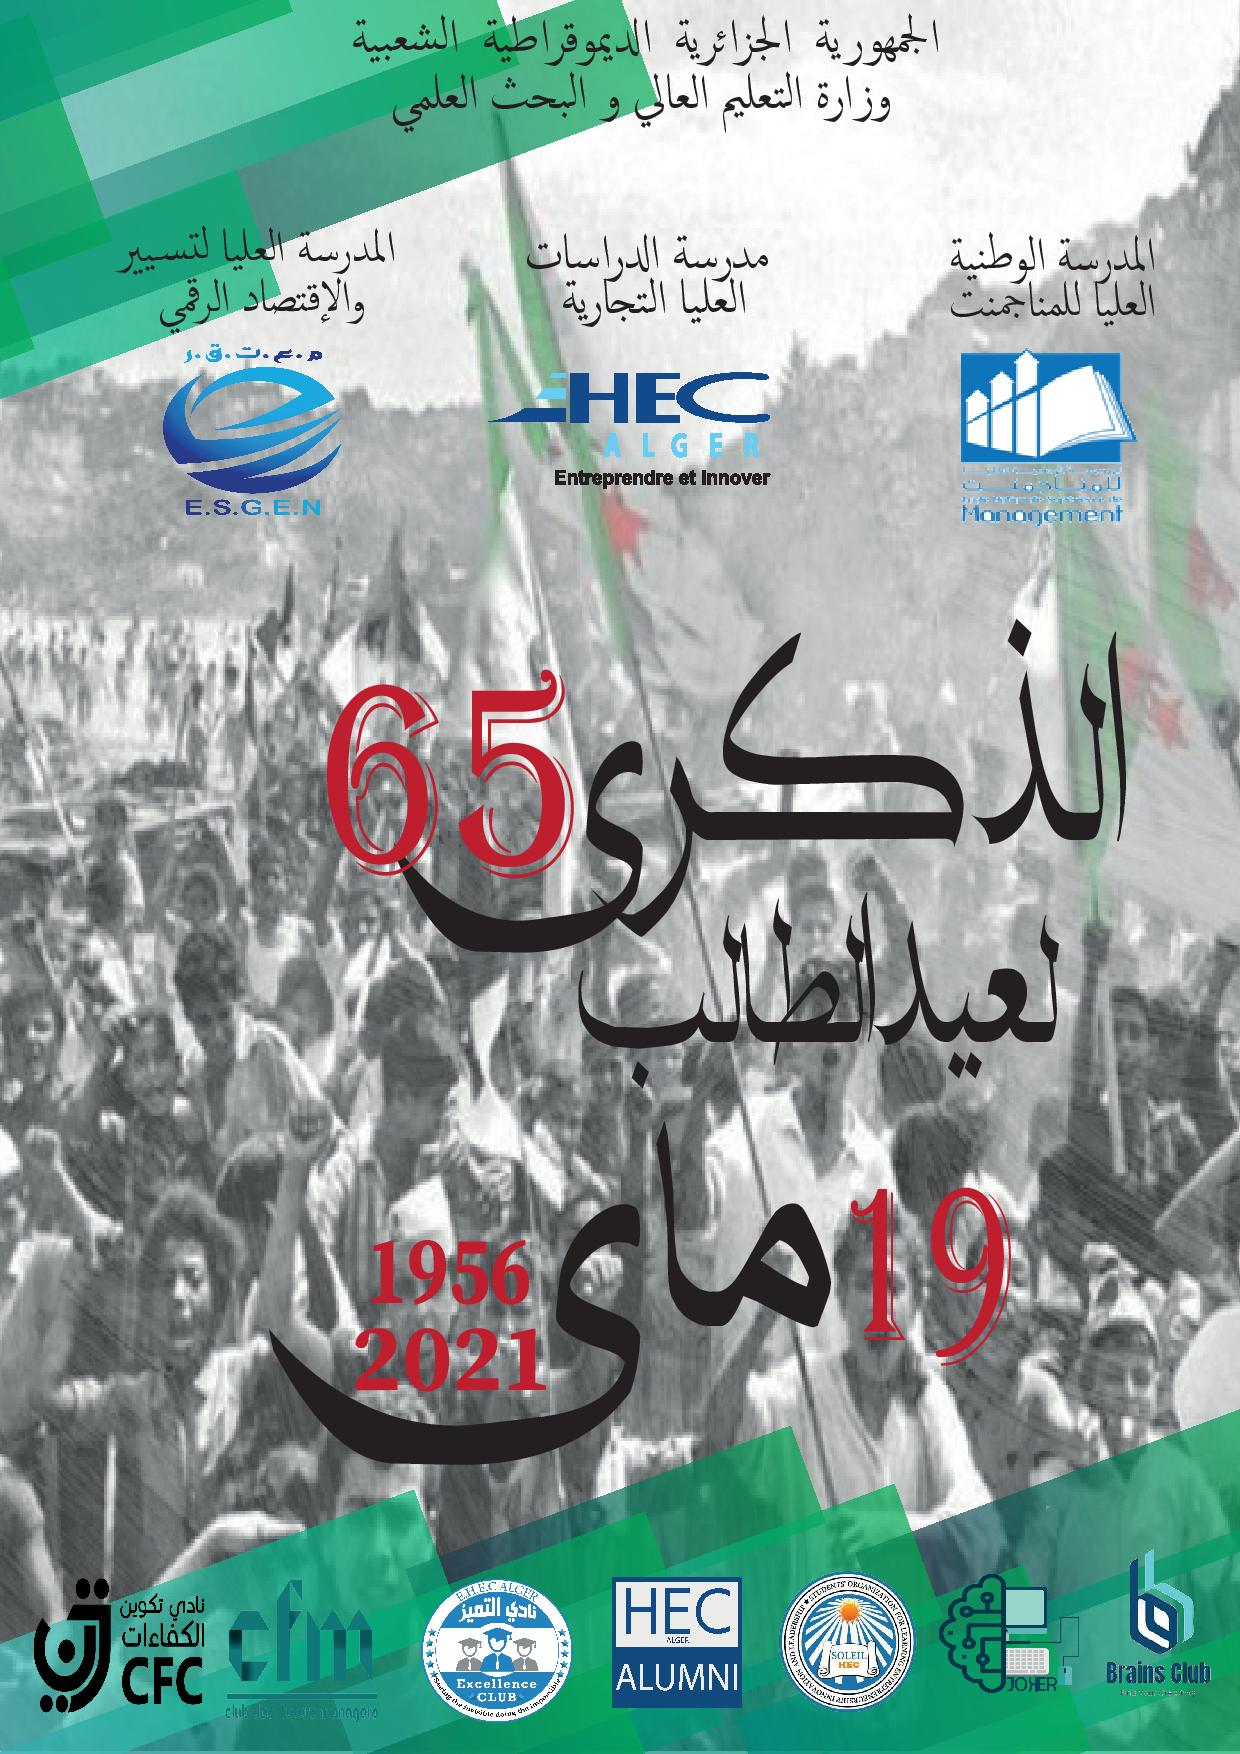 Celebration of May 19, 1956